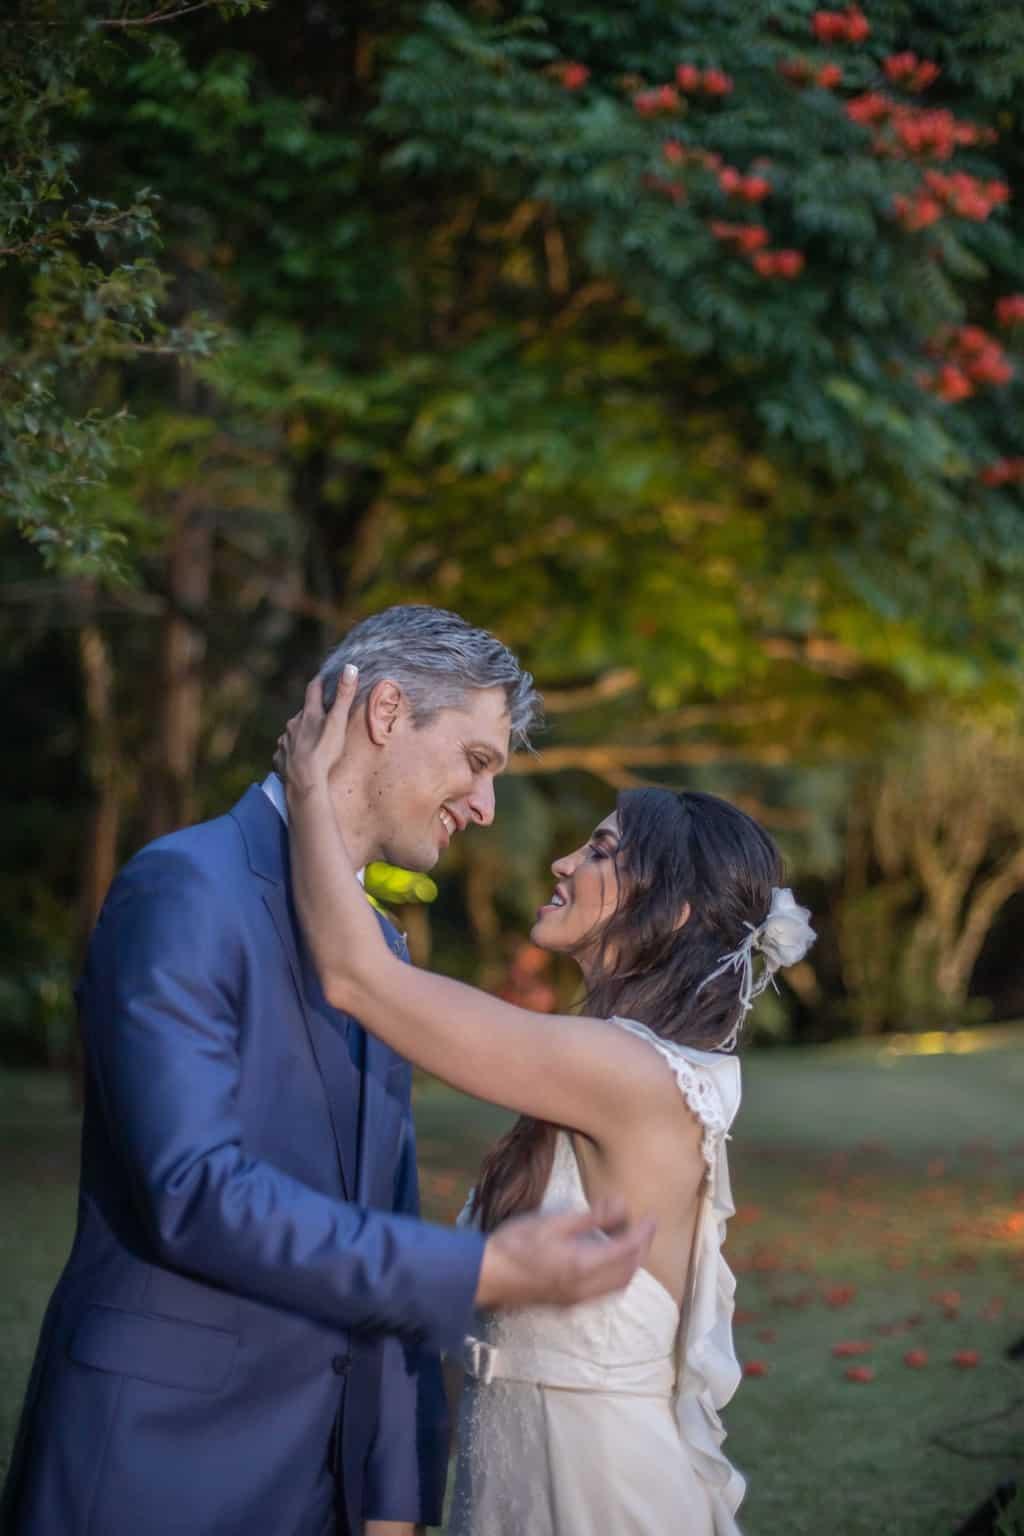 casamento-na-serra-foto-dos-noivos-Fotografia-Laura-Campanella-fotos-a-tarde-graviola-filmes-Juliana-e-Sebastian-noivos-no-altar-Pousada-La-Belle-Bruna148